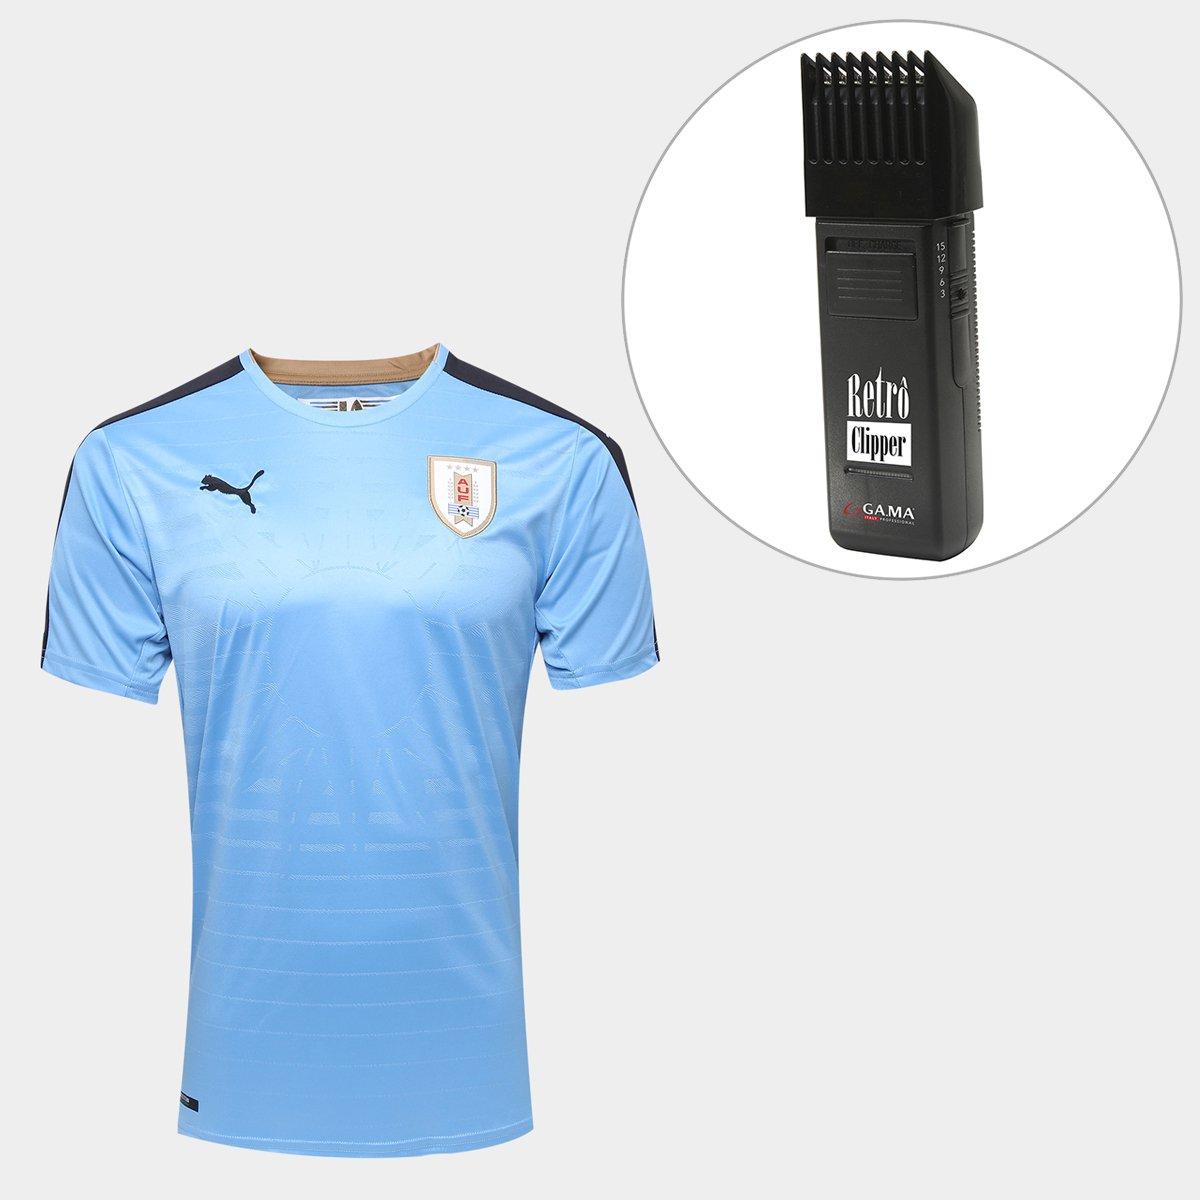 6f7ca5be41dd5 ... Kit Camisa Seleção Uruguai Home 17 18 Torcedor Puma Masculina + Maquina  Retrô Gama Italy Bivolt ...